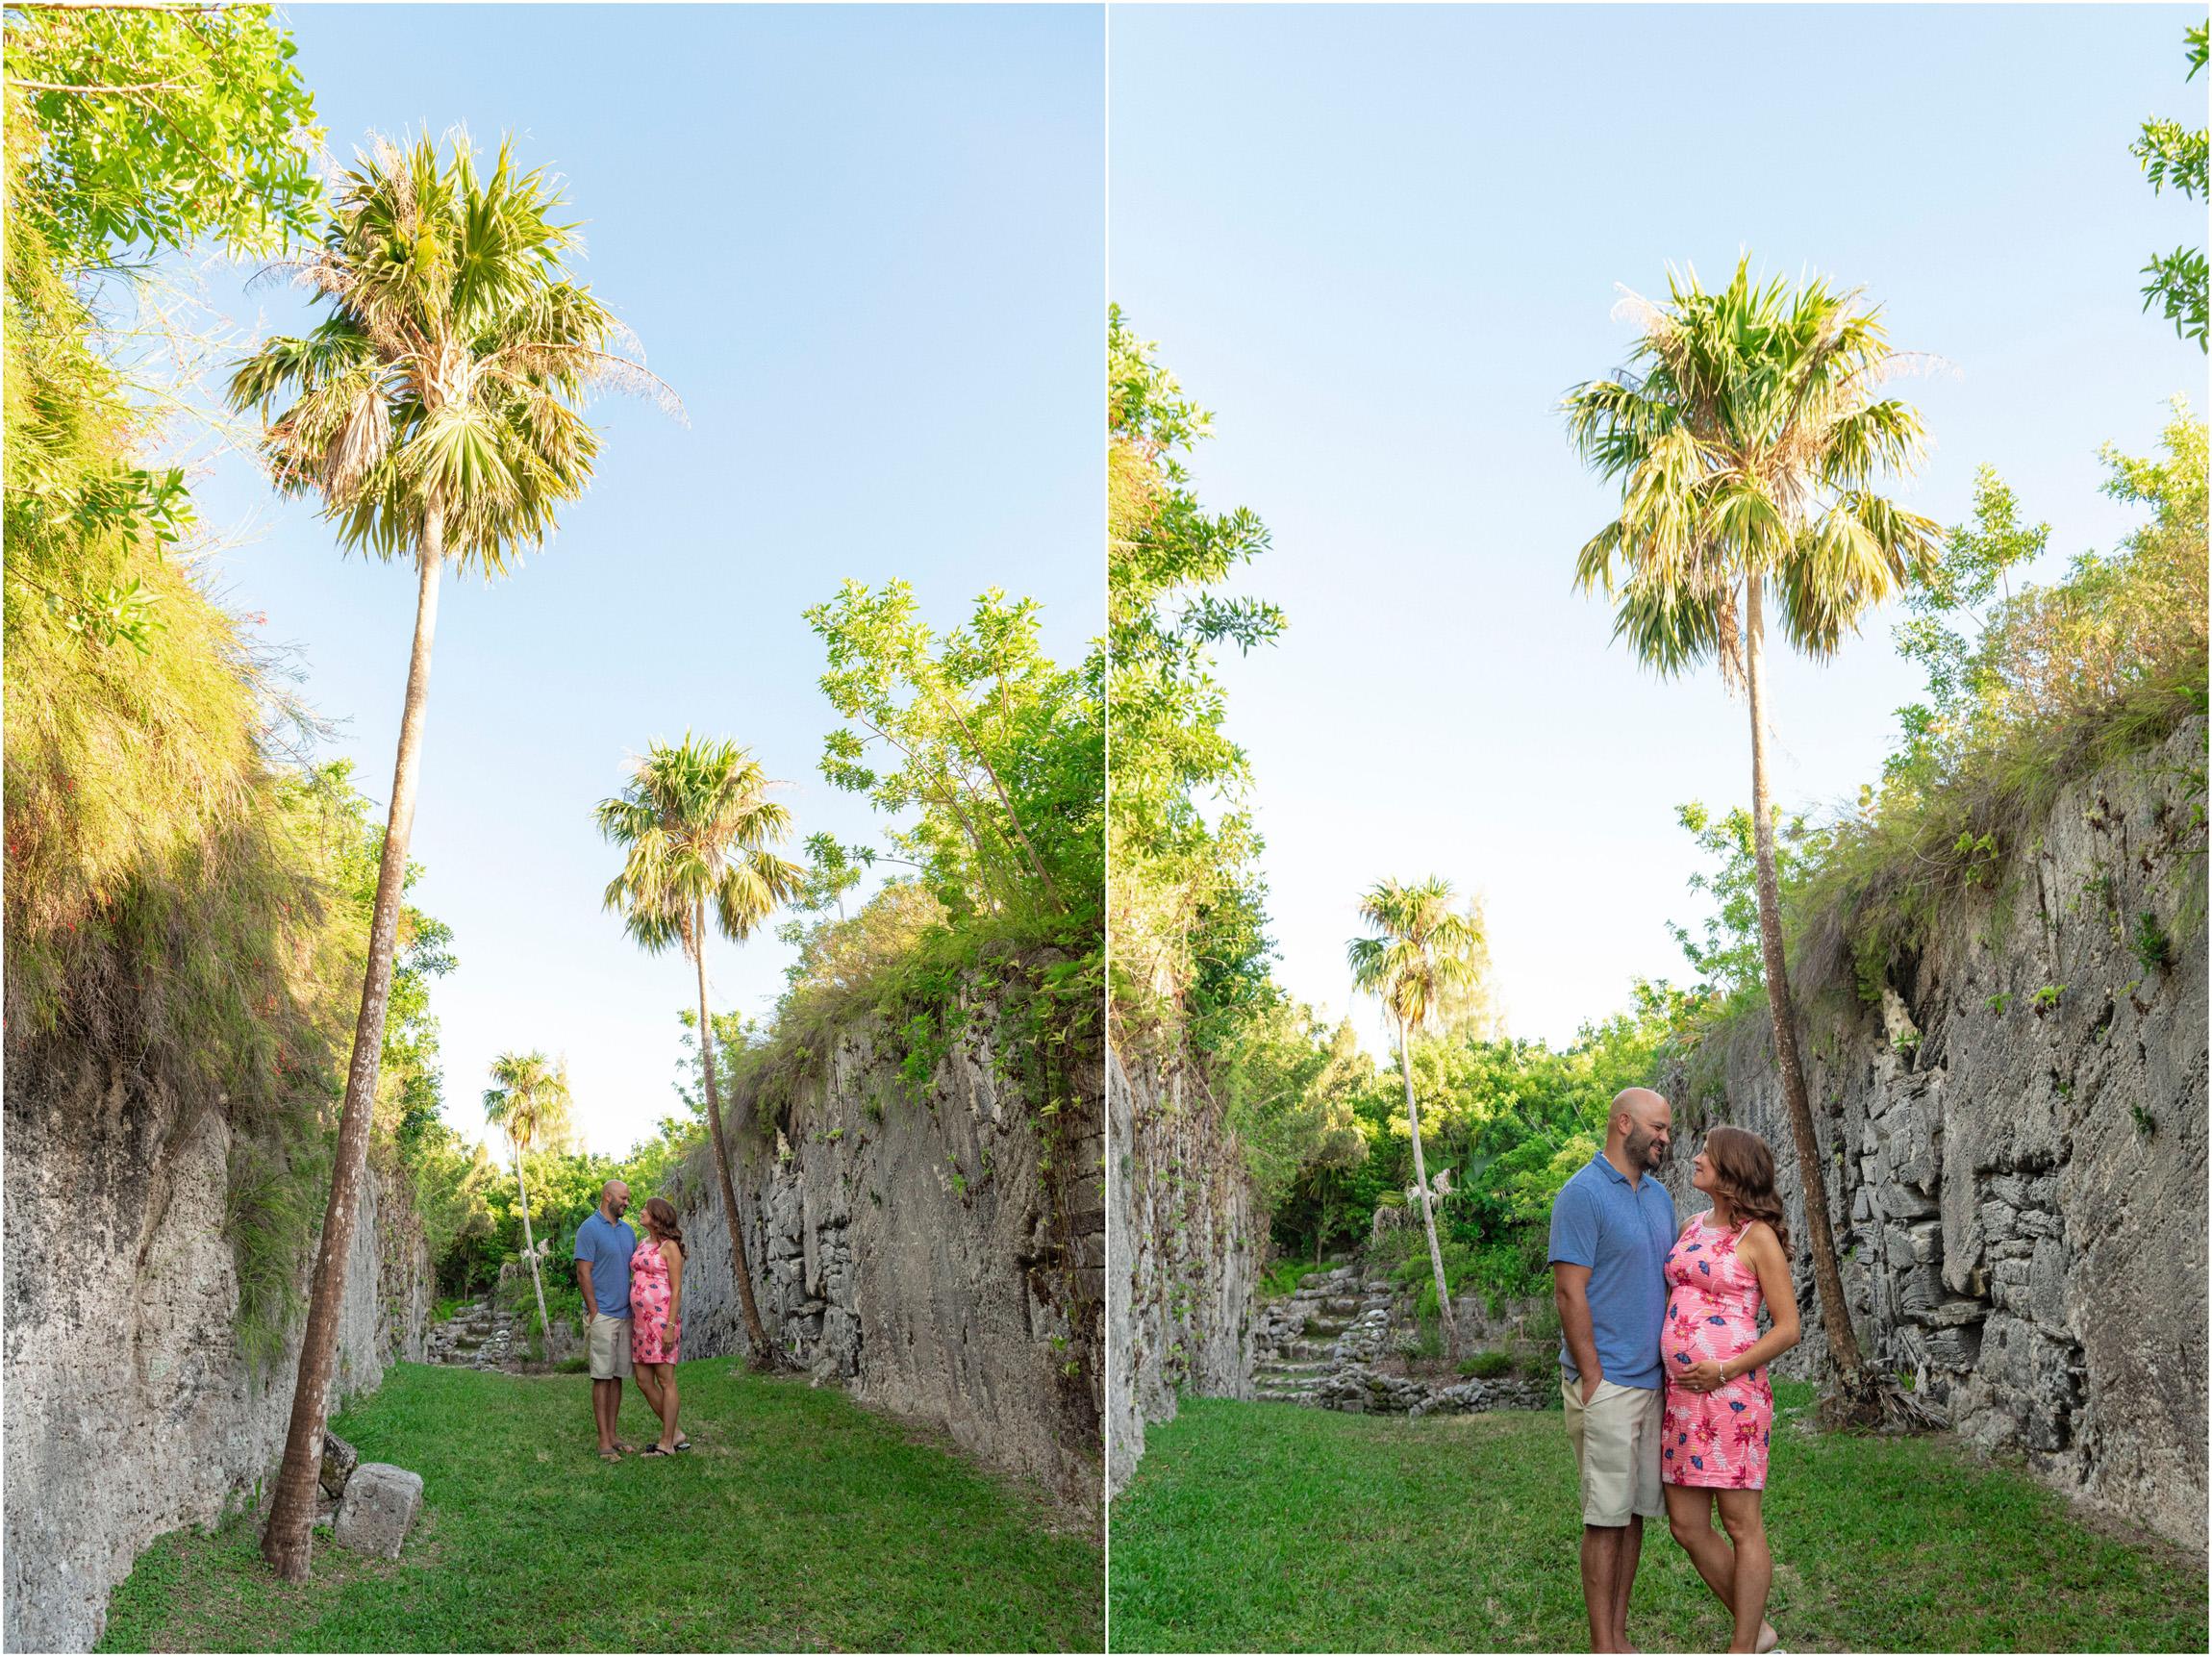 ©FianderFoto_Bermuda Maternity Photographer_Elys Harbour_Ft Scaur_Airbnb_Victoria_Mike_011.jpg